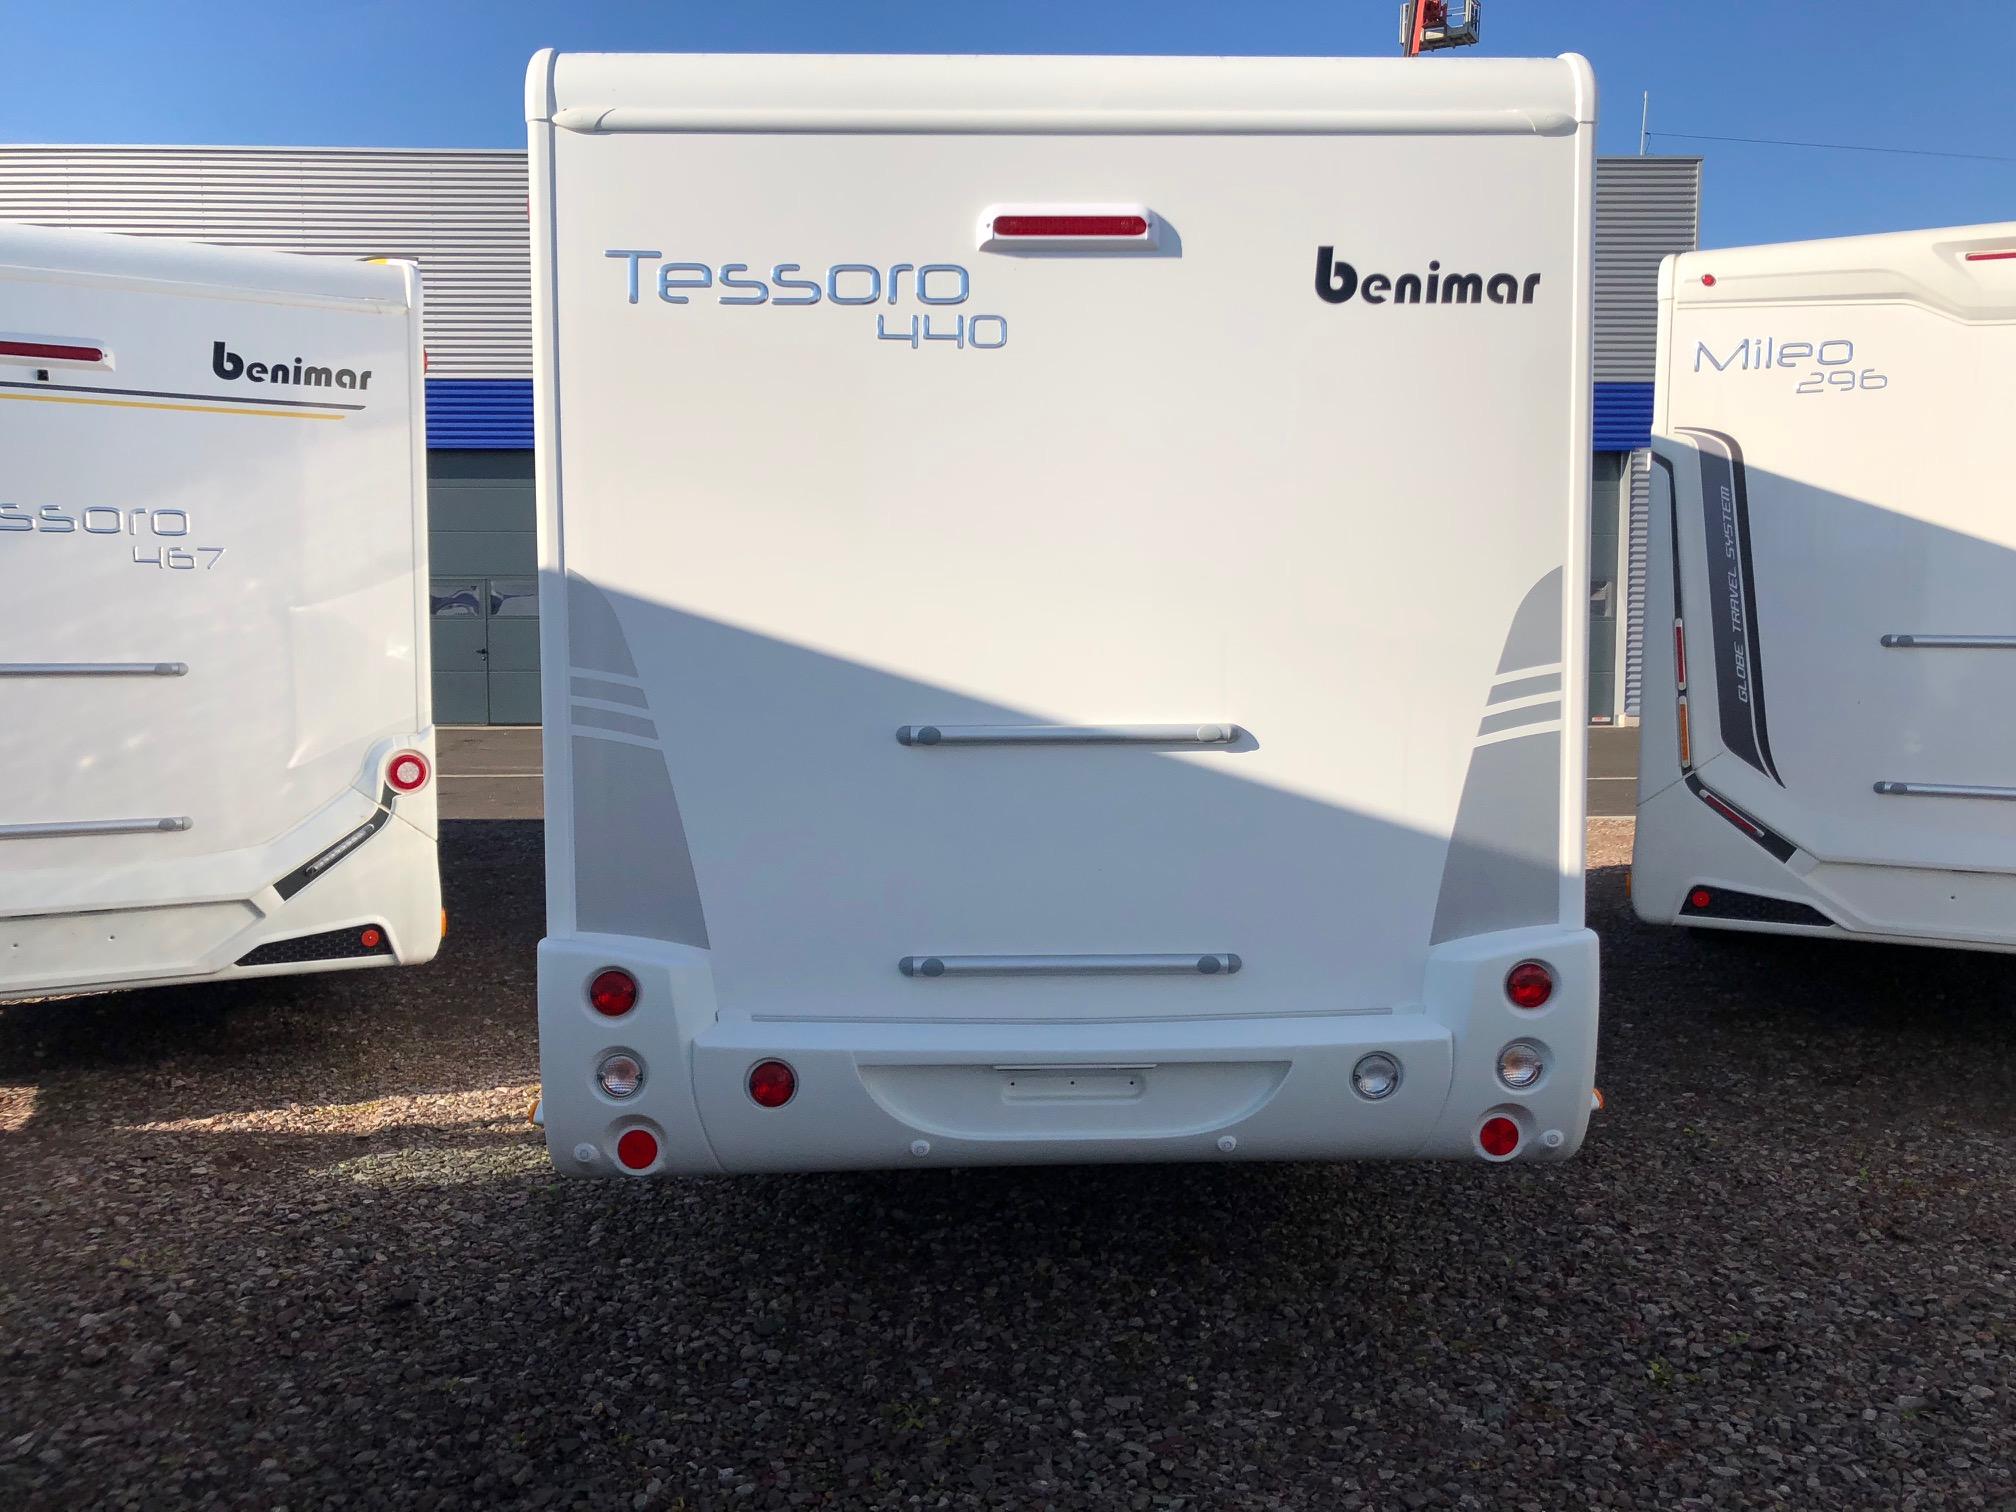 Benimar Tessoro 440 Up - 2